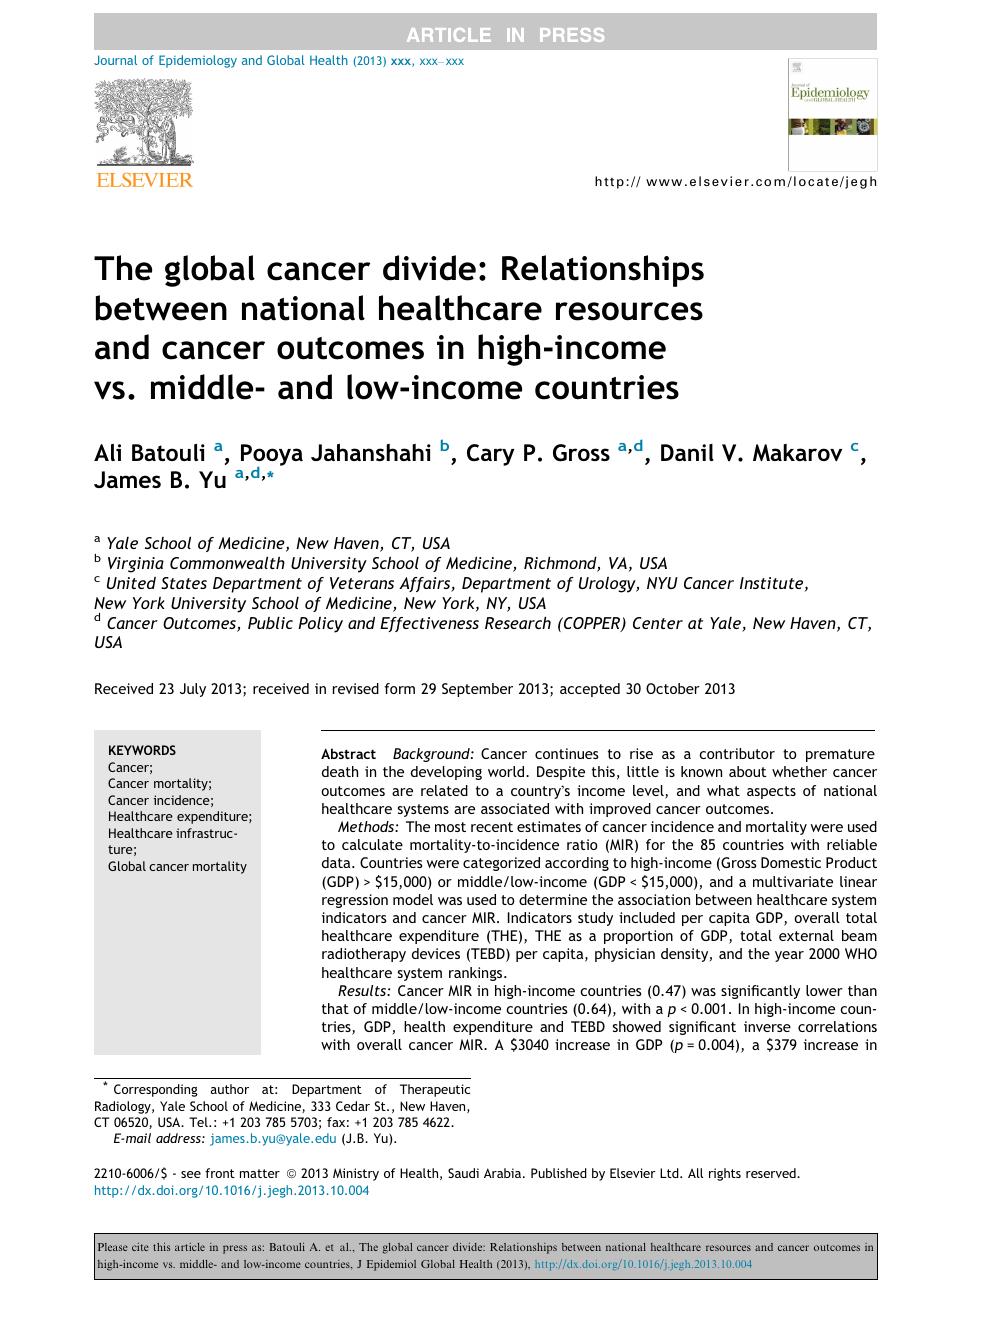 The global cancer divide: Relationships between national